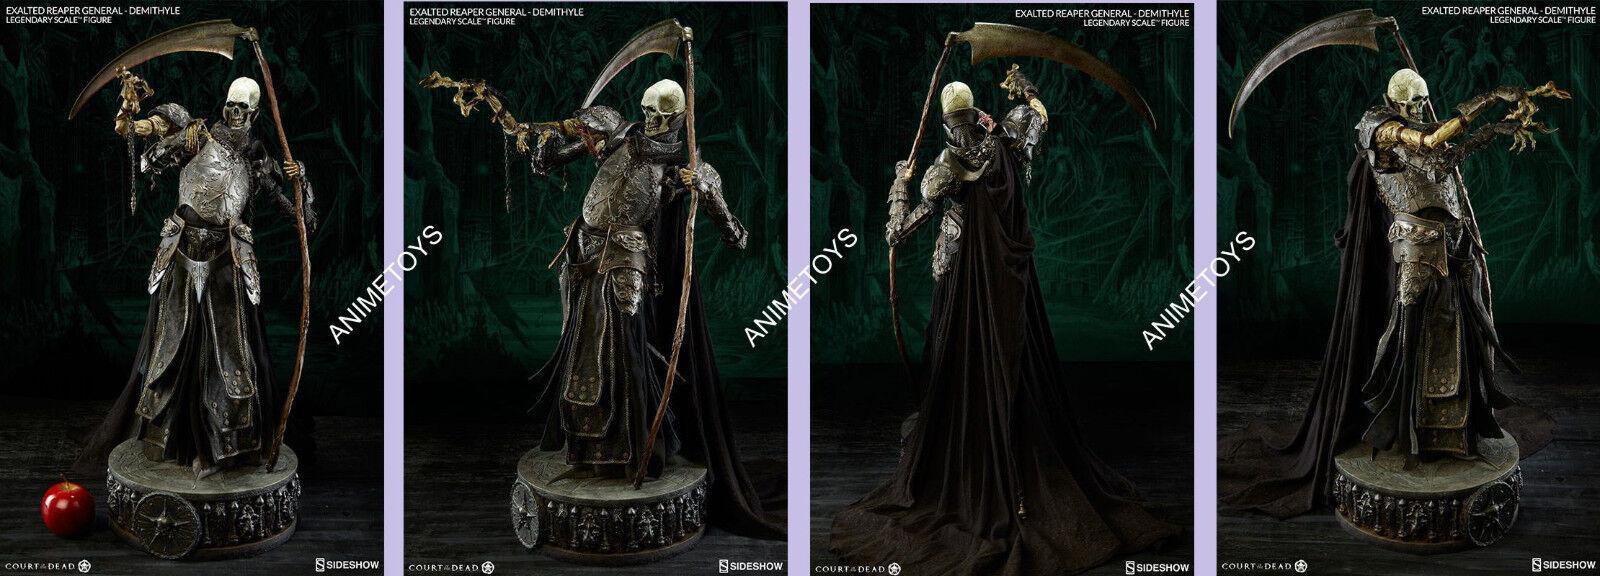 SIDESHUR  FRAR5533;C DOMSTOL    DAD  DAR553333;C Exalted Reaper General Demithyle   65533;C Legendary skala